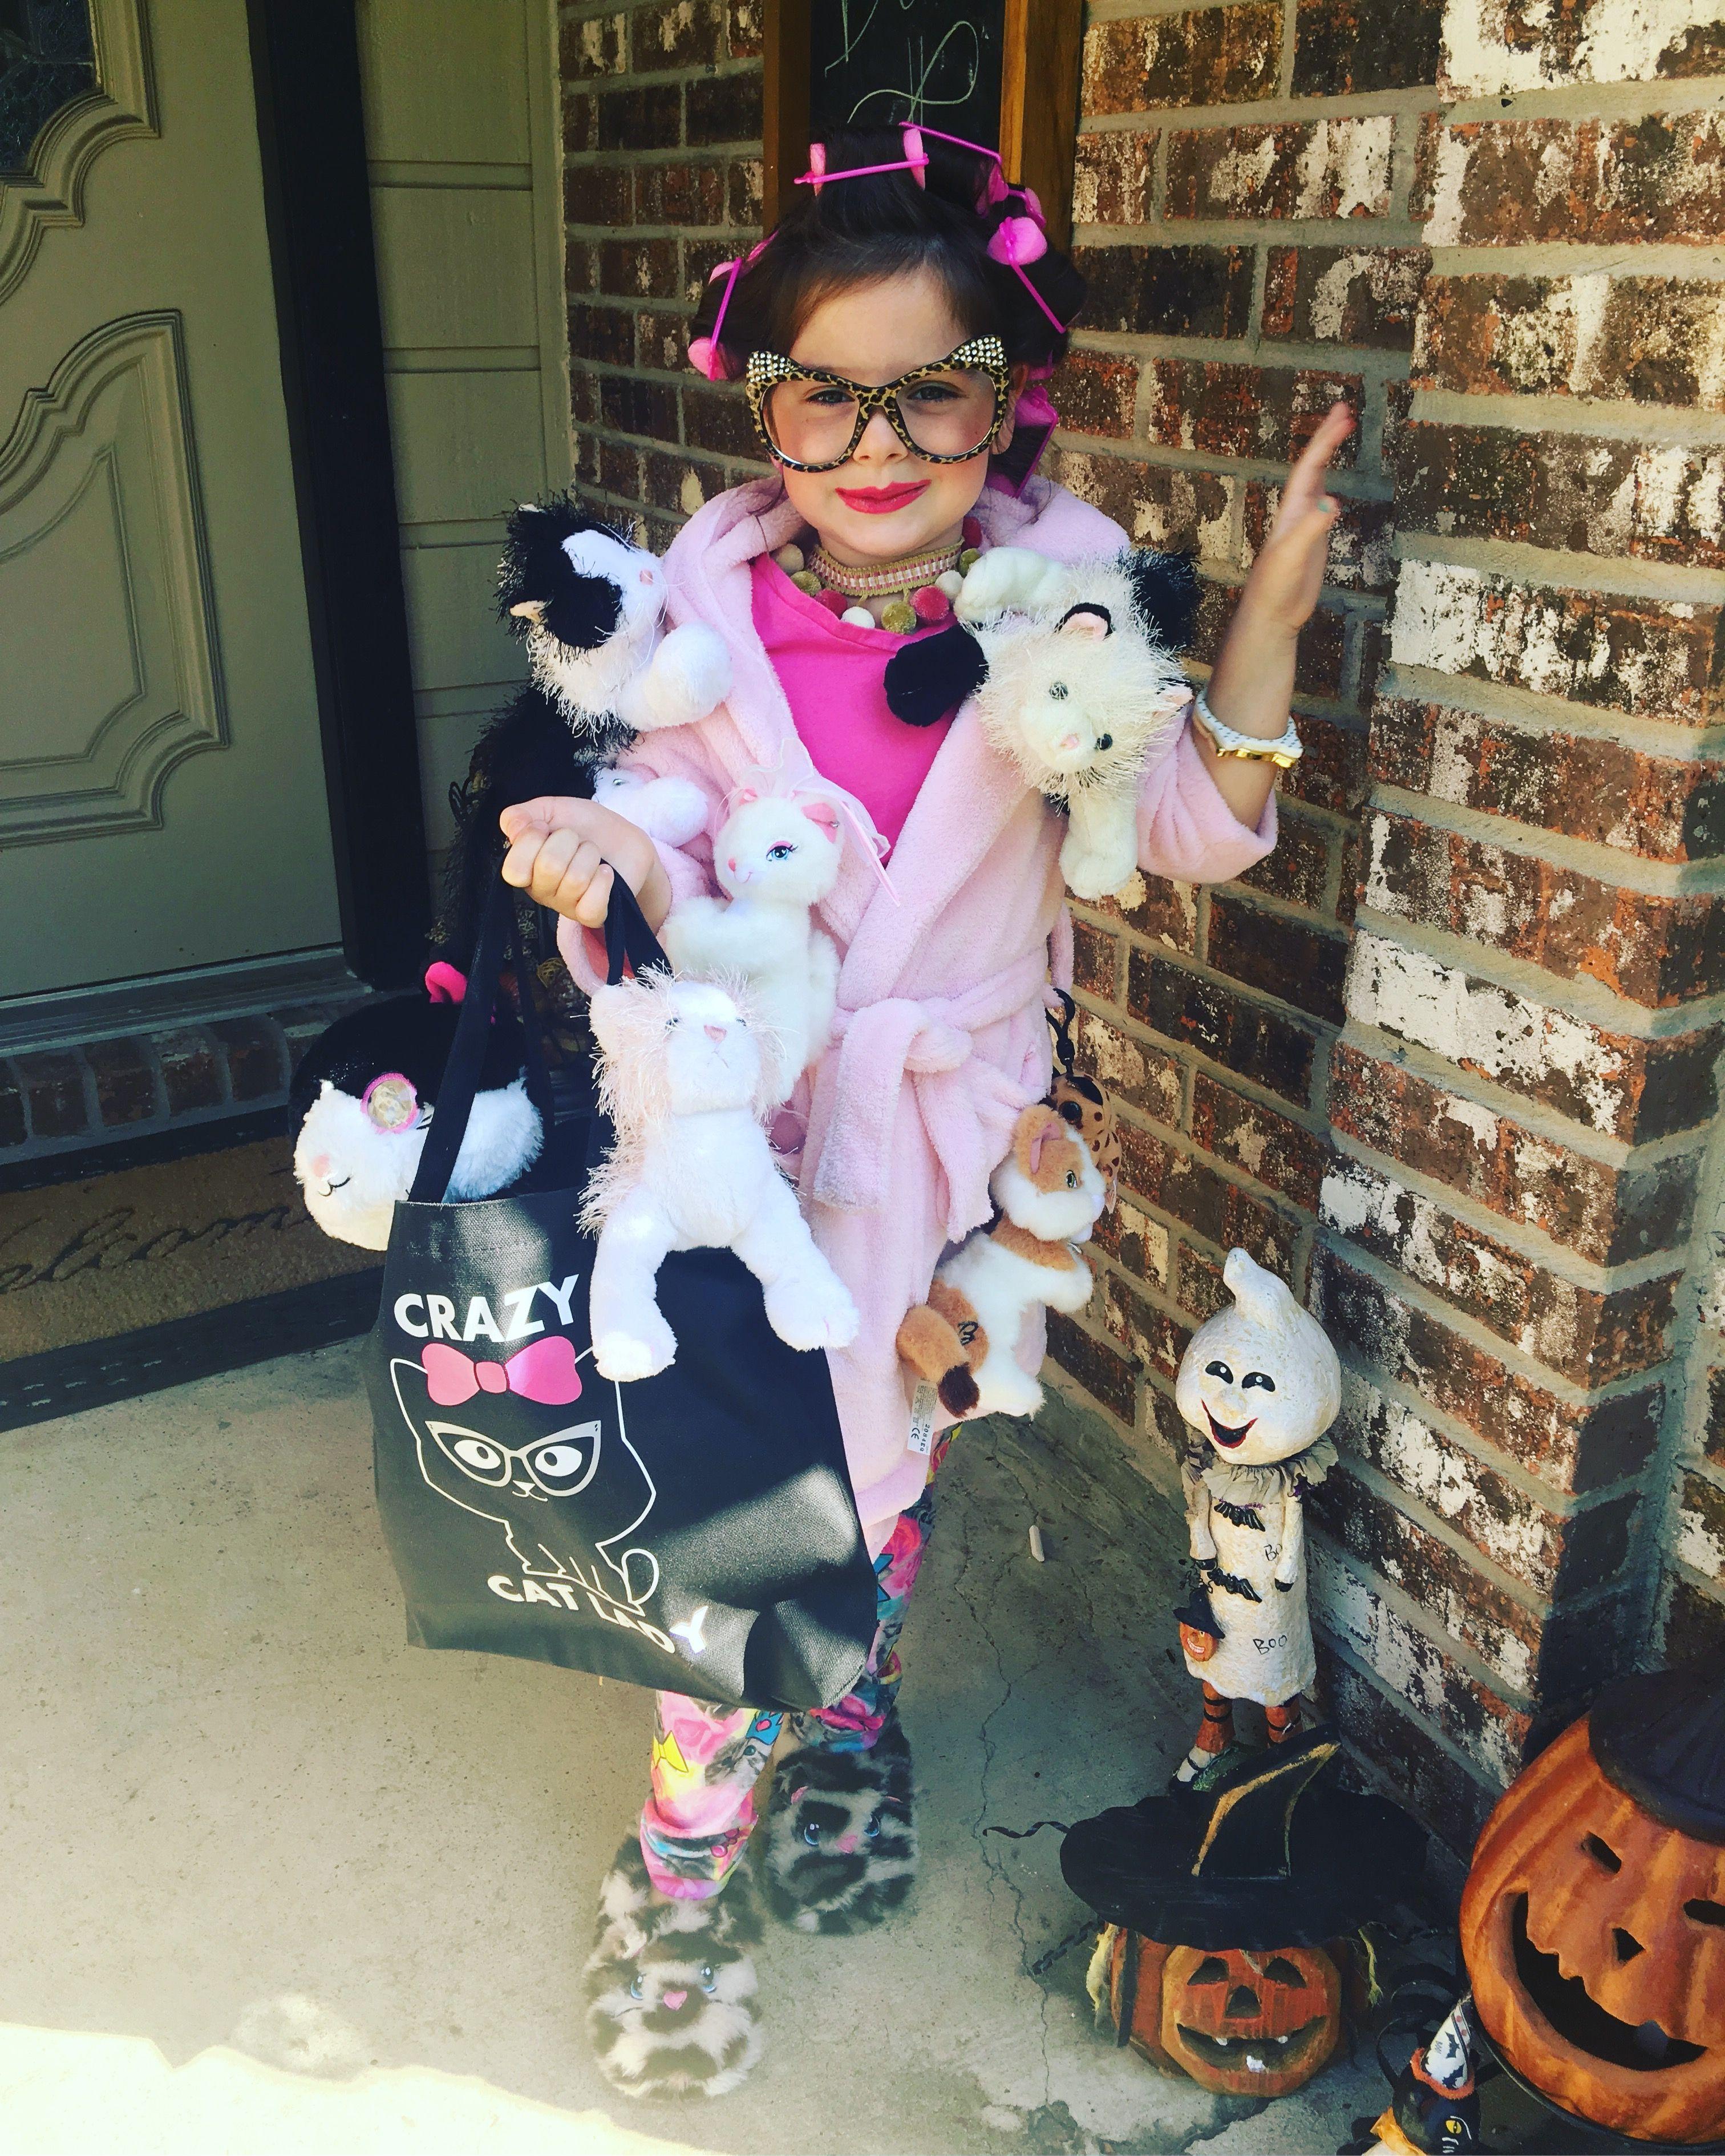 Crazy Cat Lady | Crazy cat lady halloween costume, Crazy ...